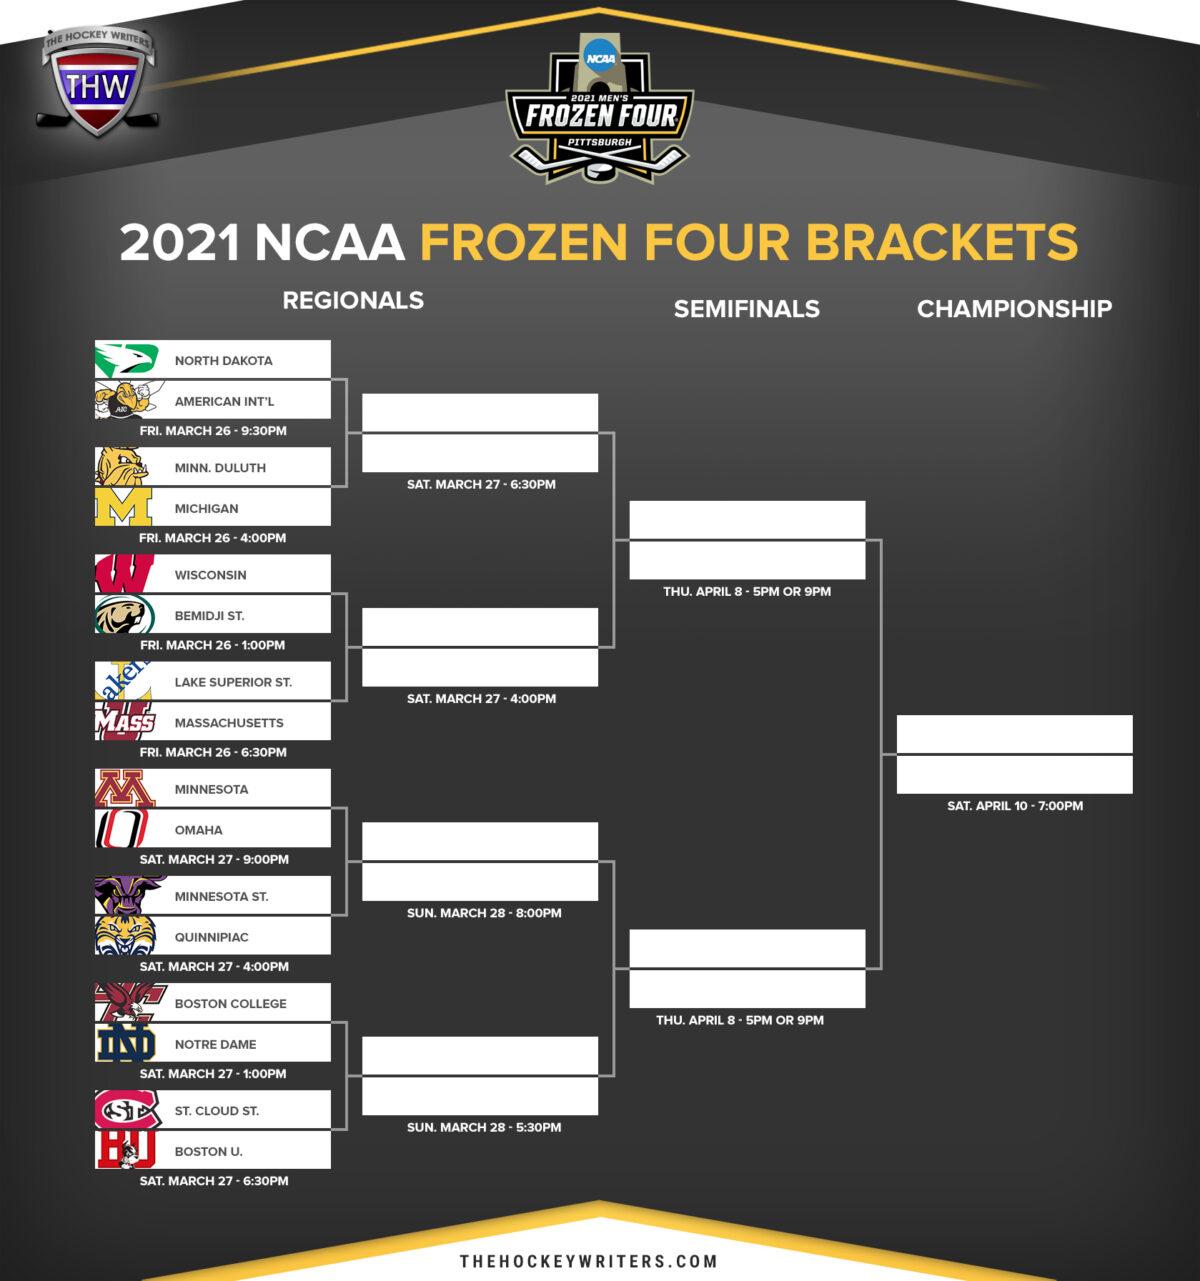 2021 NCAA Frozen Four Brackets